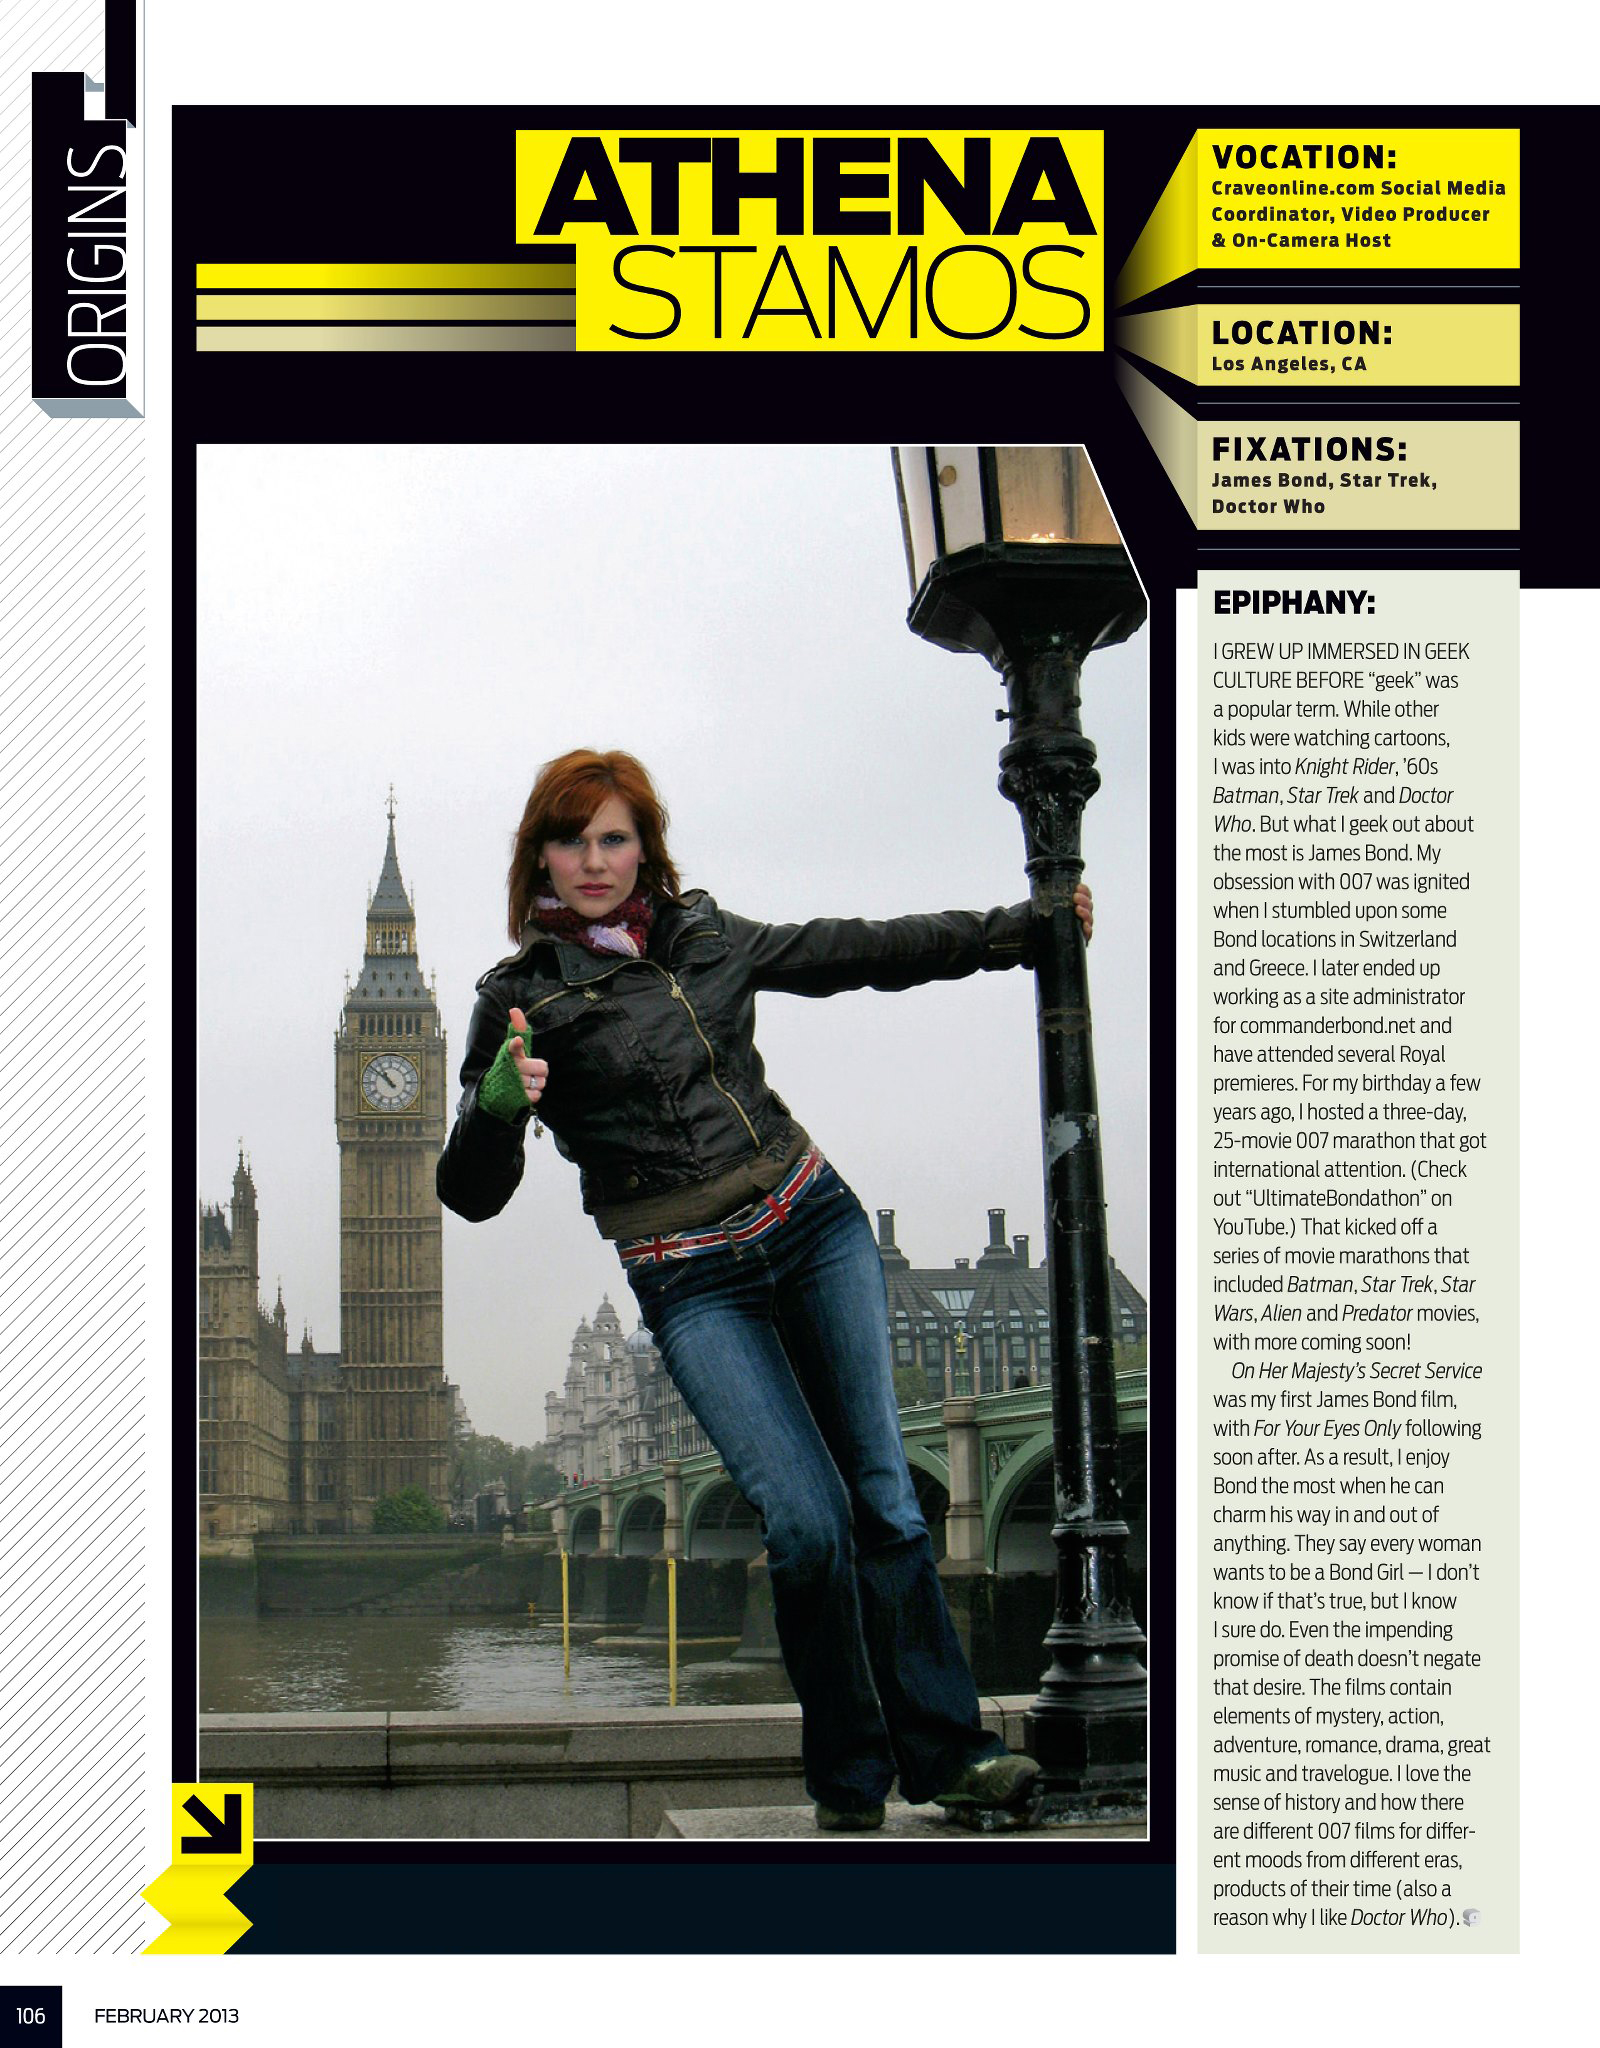 GEEK Magazine , volume 5. Representing James Bond as a team member at  commanderbond.net . Photographer: David Winter